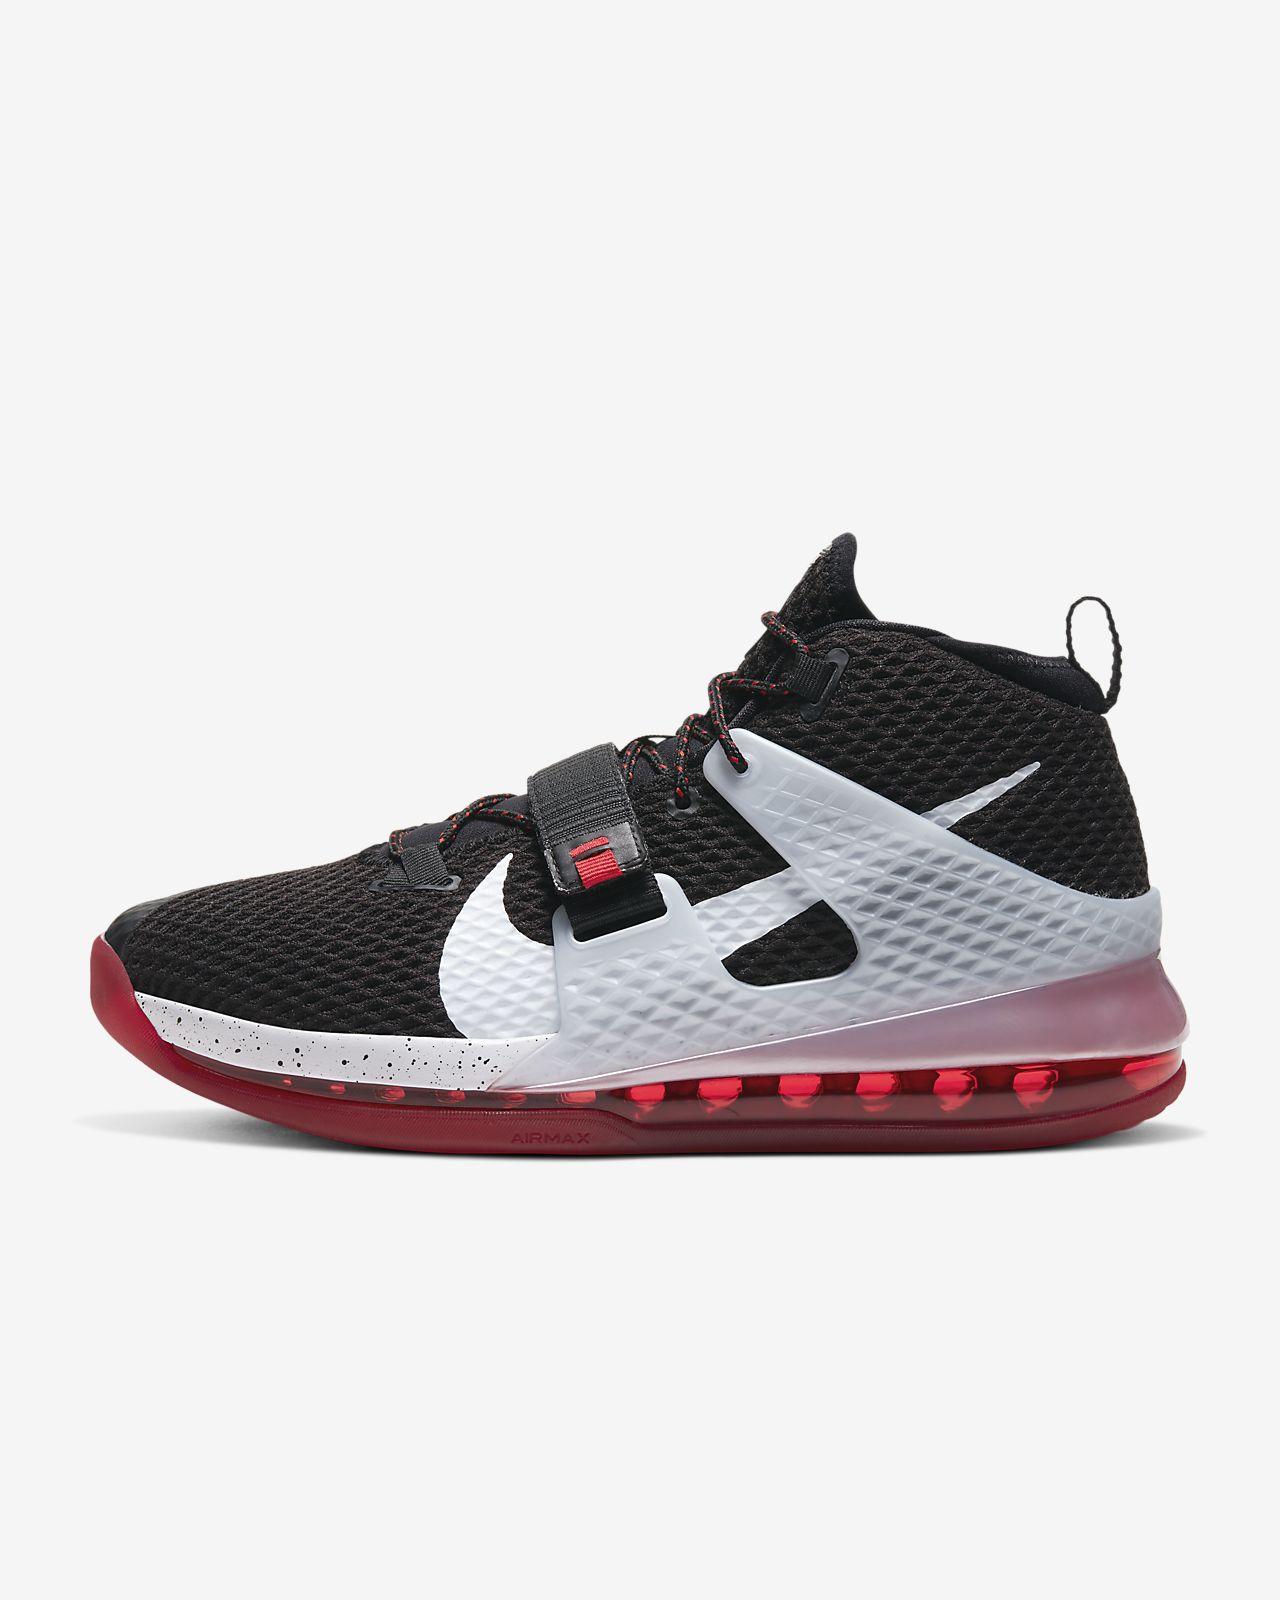 Calzado de básquetbol Nike Air Force Max I